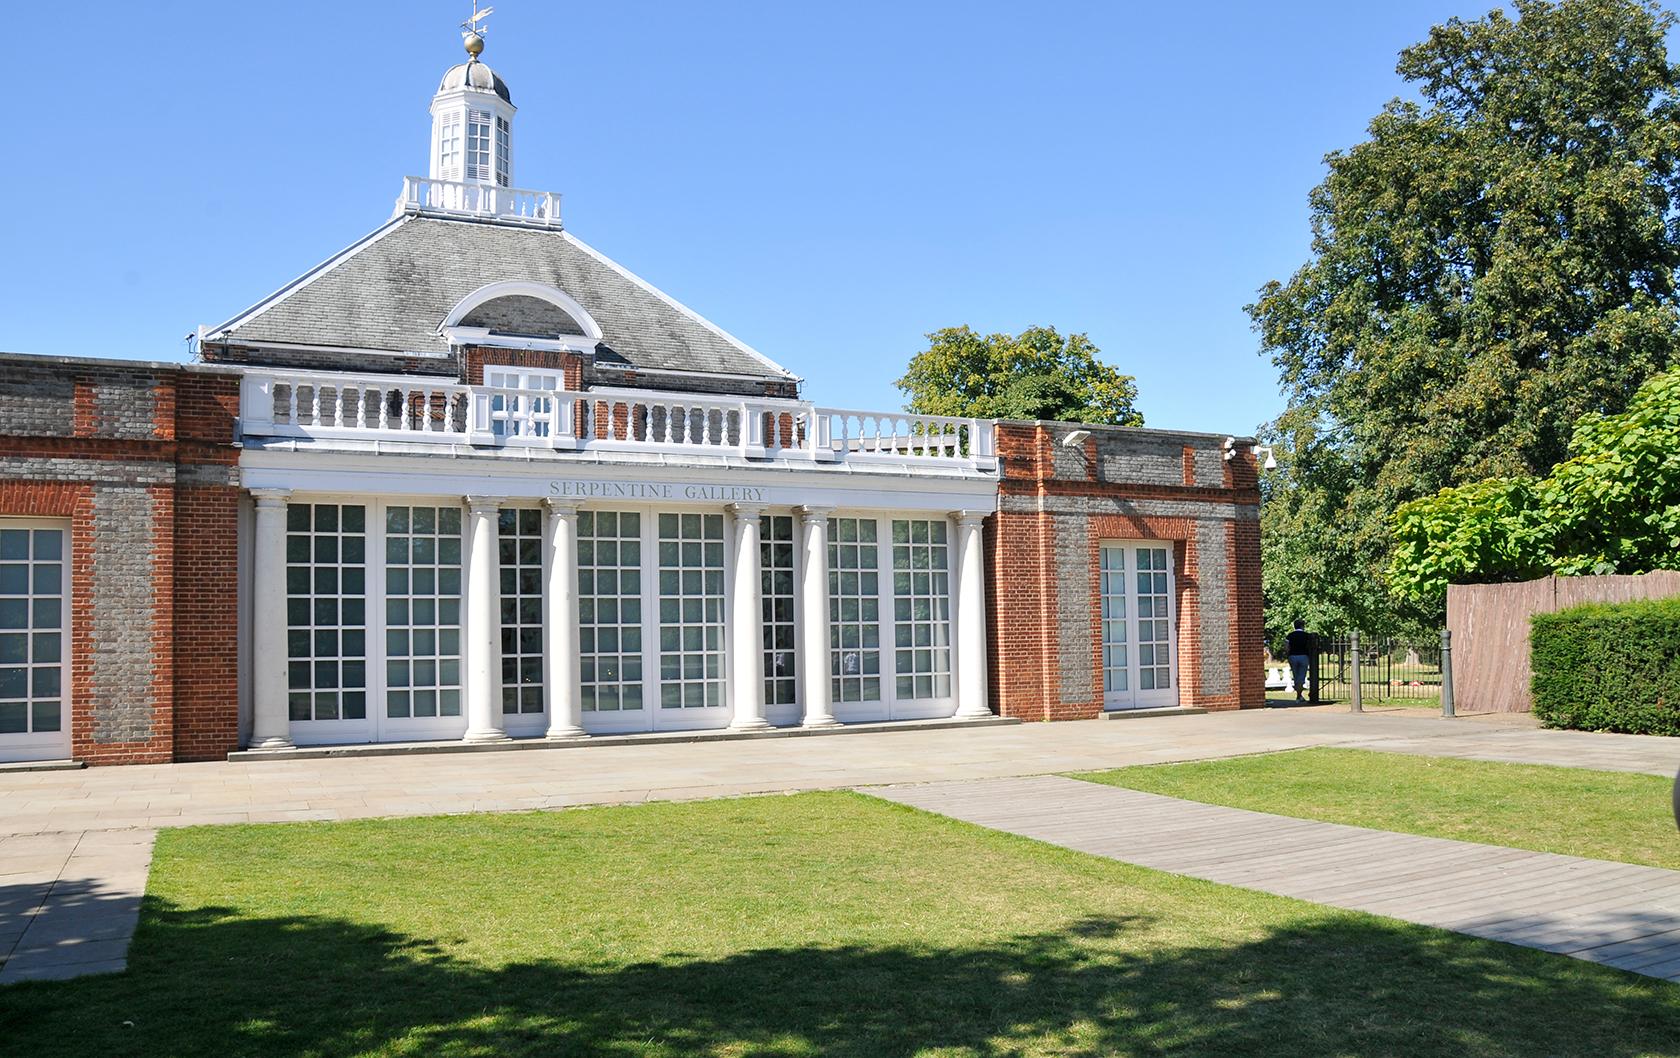 Serpentine Gallery in Kensington Gardens